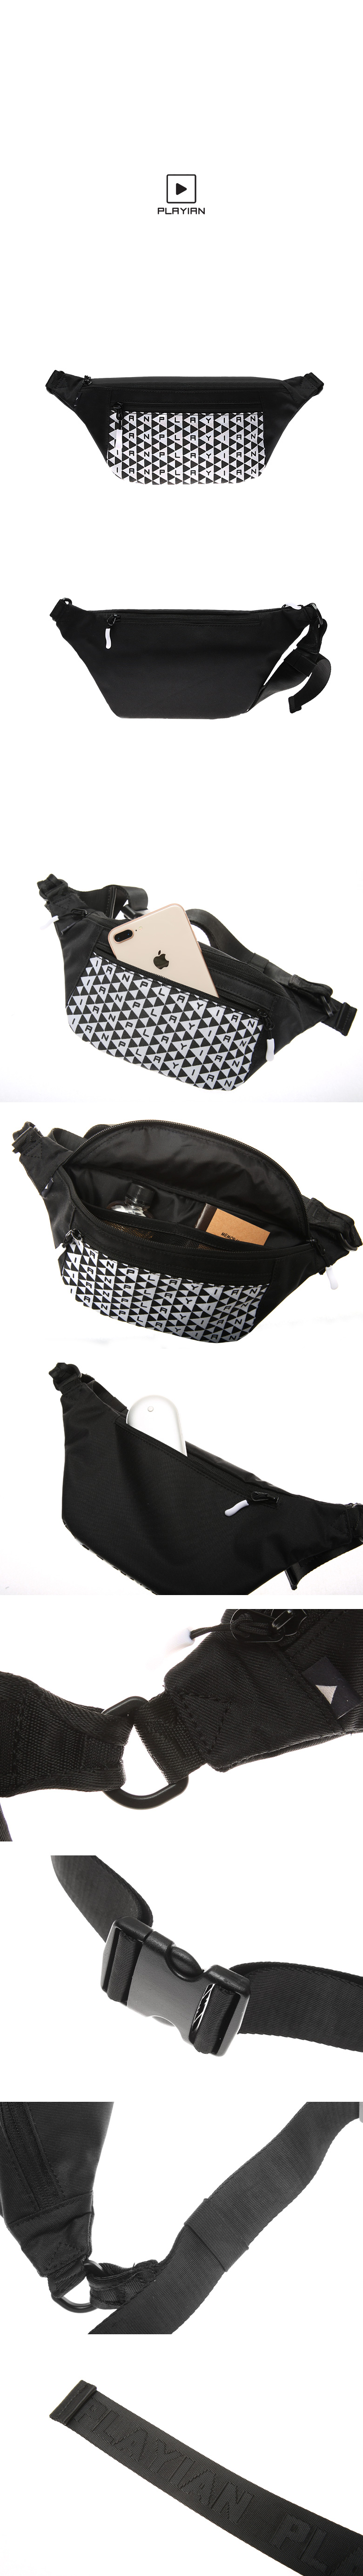 Gred waist bag_그리드 웨이스트백(PW02UWHA)